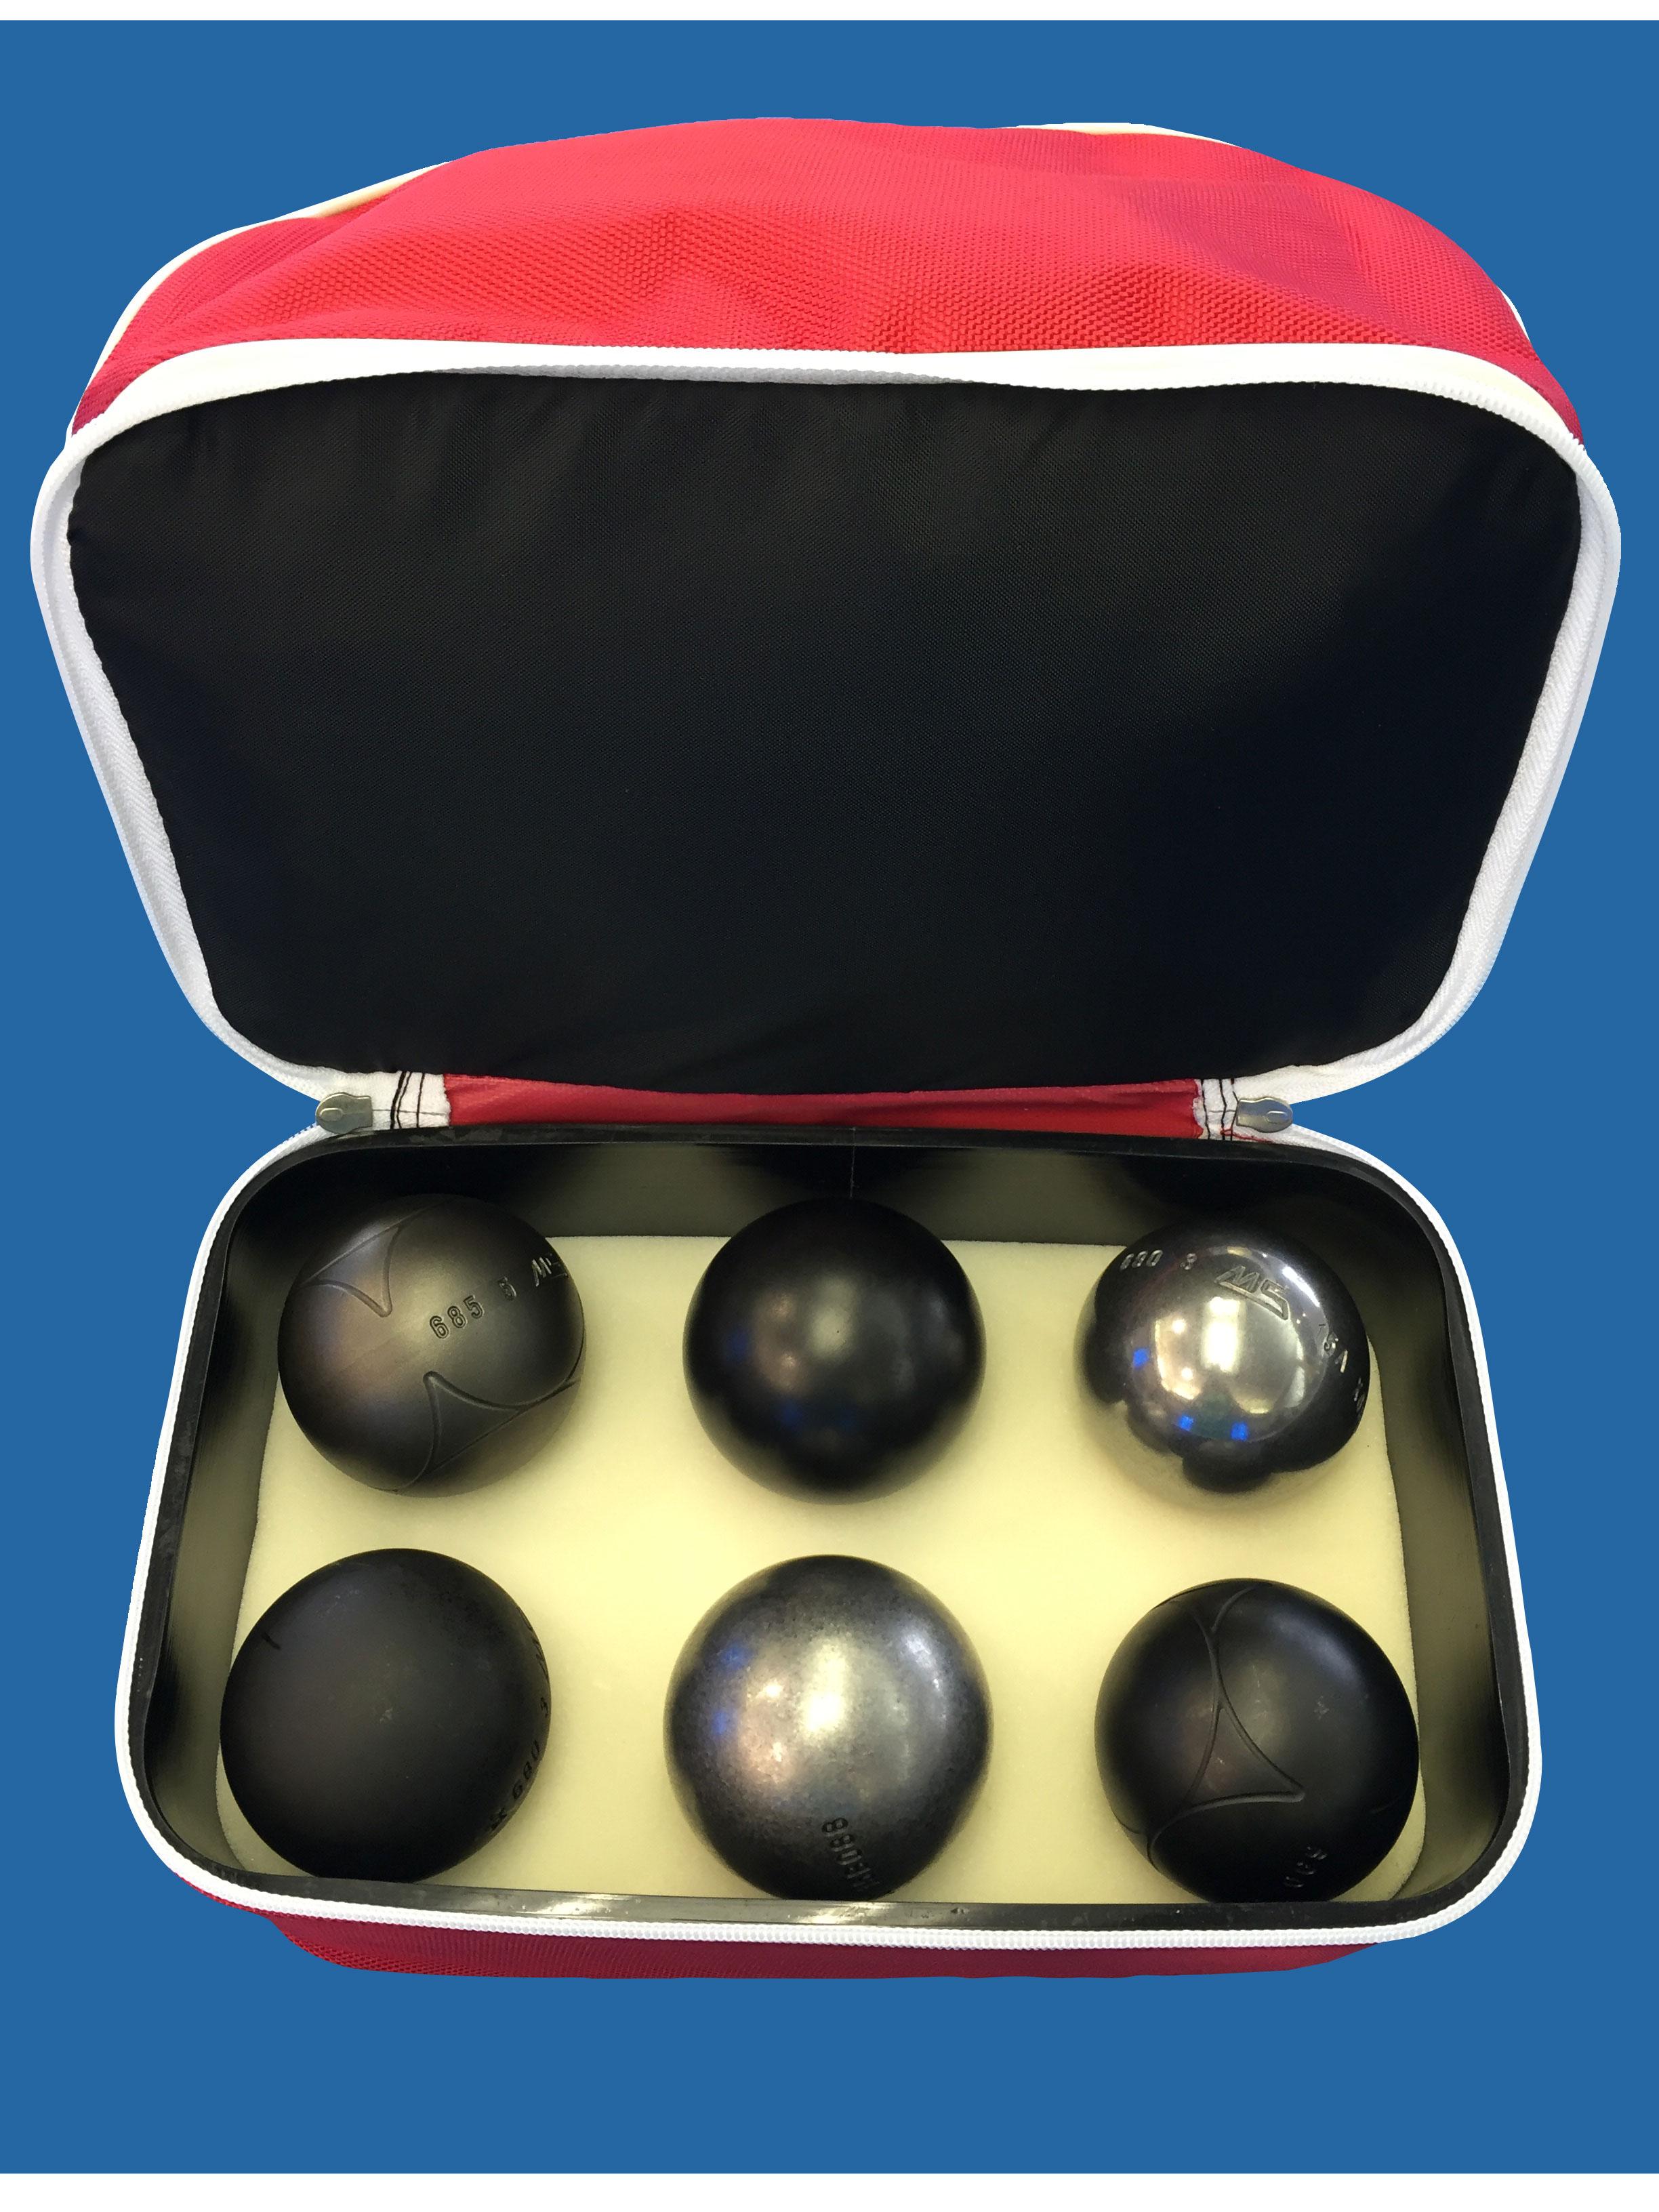 turniertasche f r 6 kugeln kaufen boule beckmann online shop. Black Bedroom Furniture Sets. Home Design Ideas